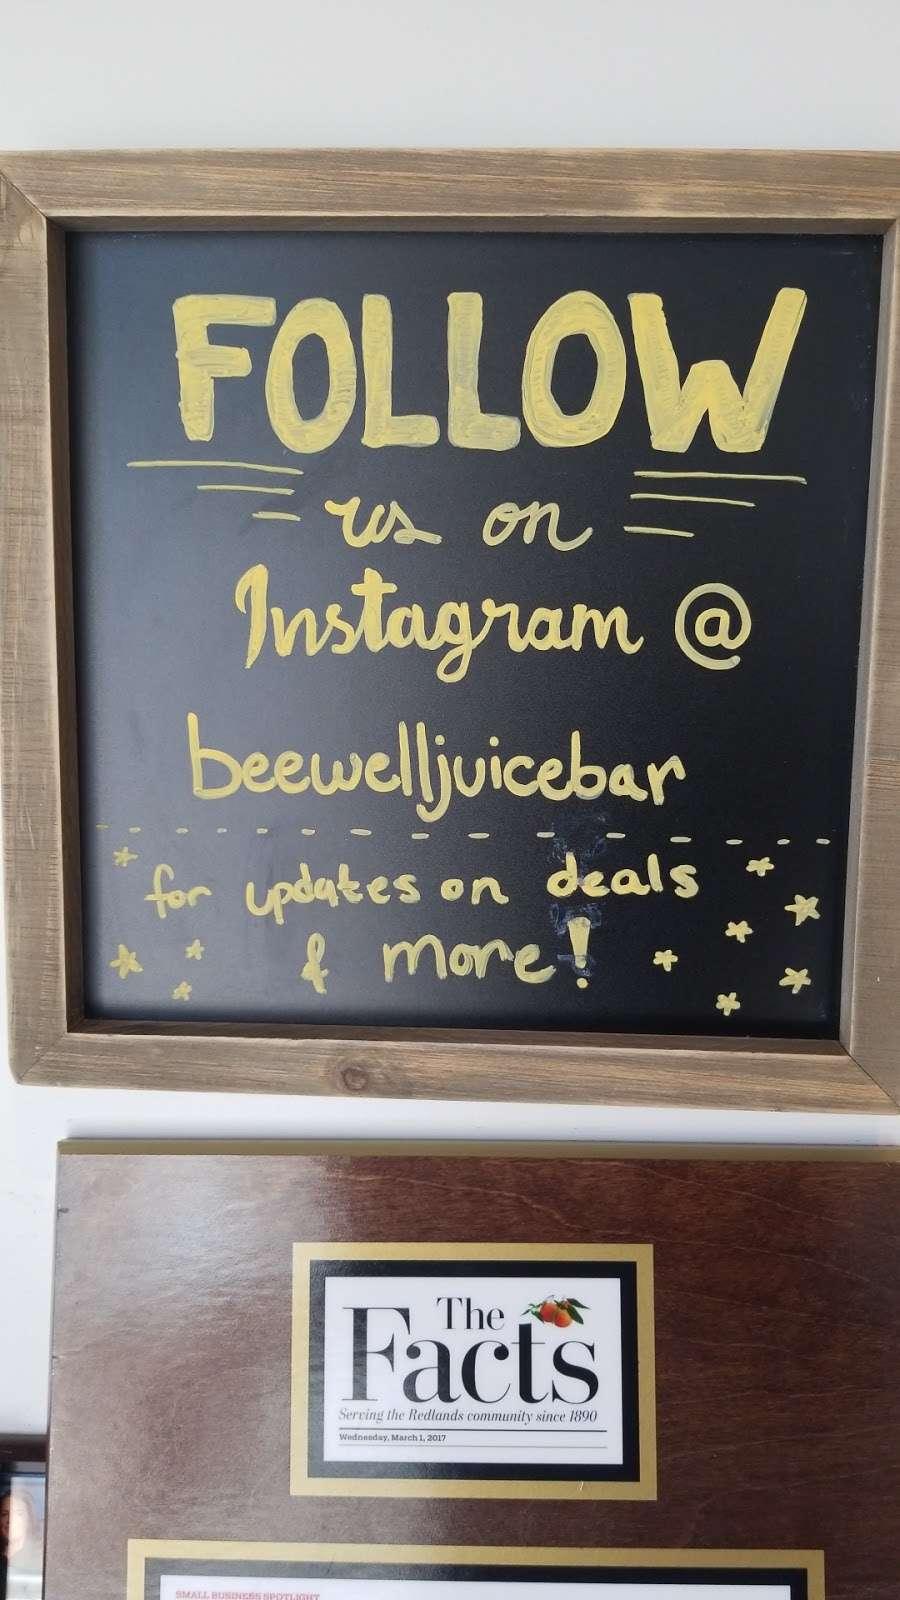 Bee Well Juice Bar & Organic eatery - cafe  | Photo 10 of 10 | Address: 33946 Yucaipa Blvd, Yucaipa, CA 92399, USA | Phone: (909) 790-9097